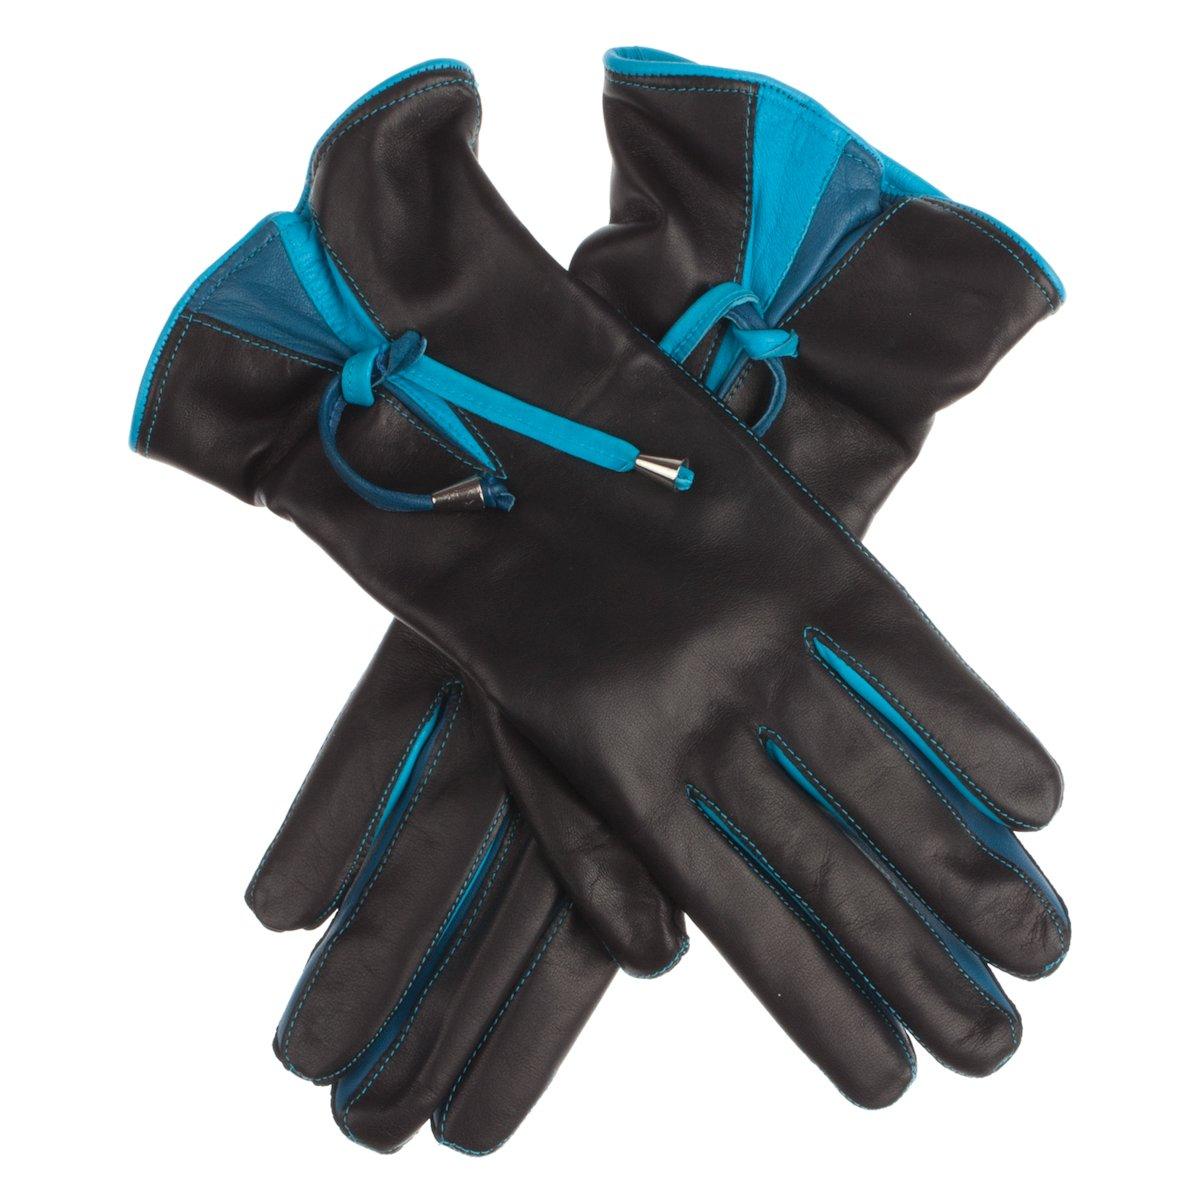 Lundorf Women's Tatiana Leather Gloves 100% Wool Lining - Danish Design - Navy - 6.5